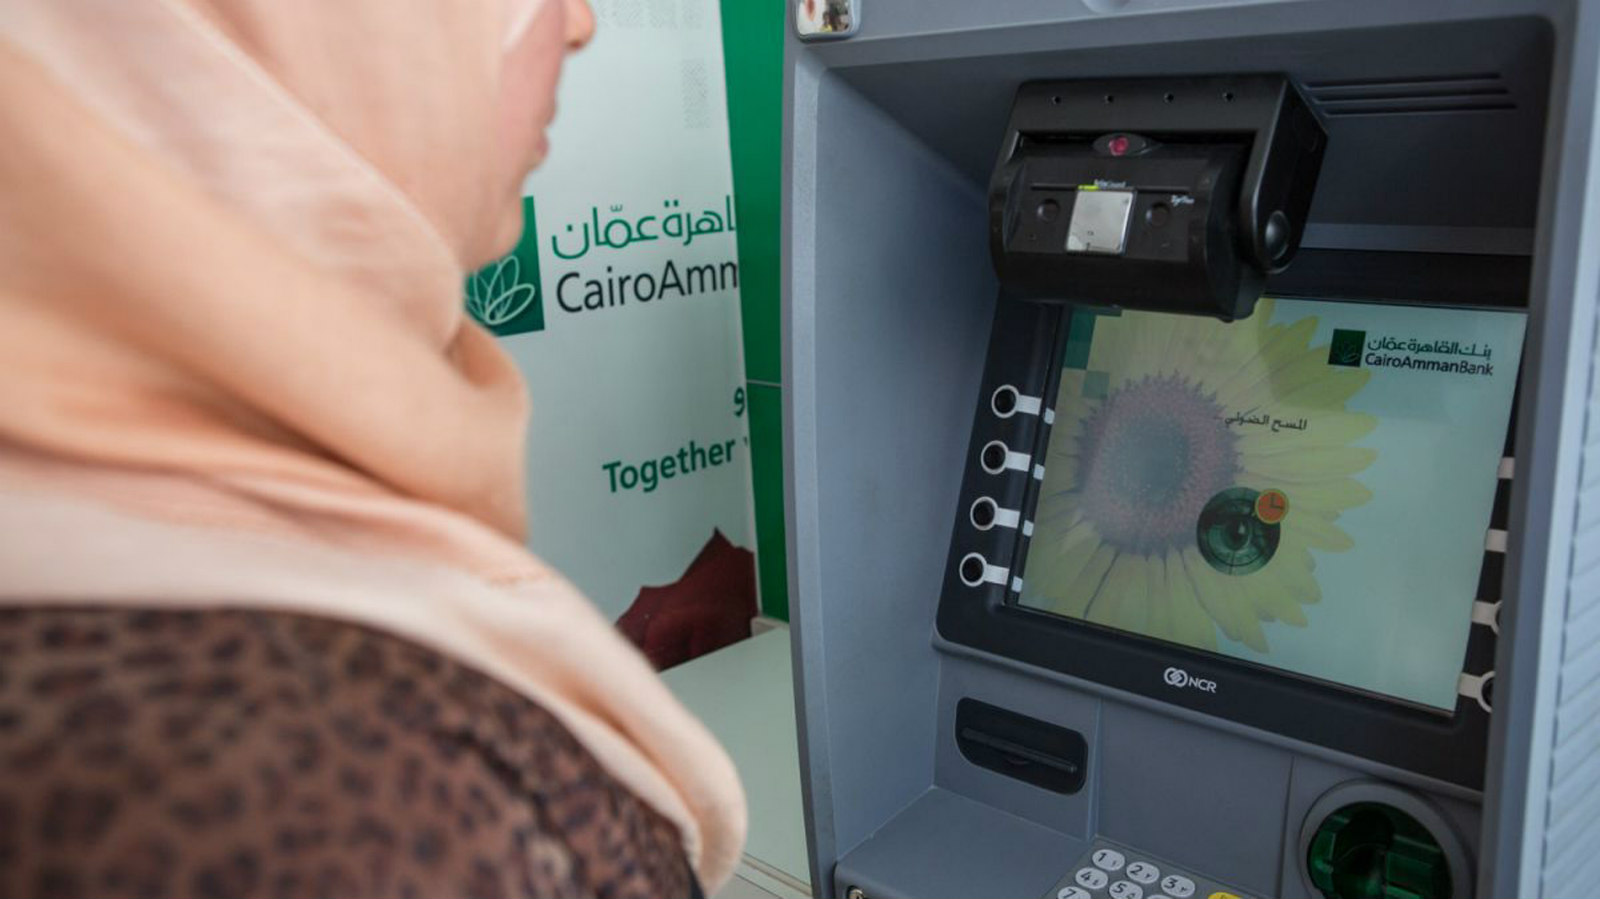 Syrian refugee at an ATM in Jordan (UNHRC.org)